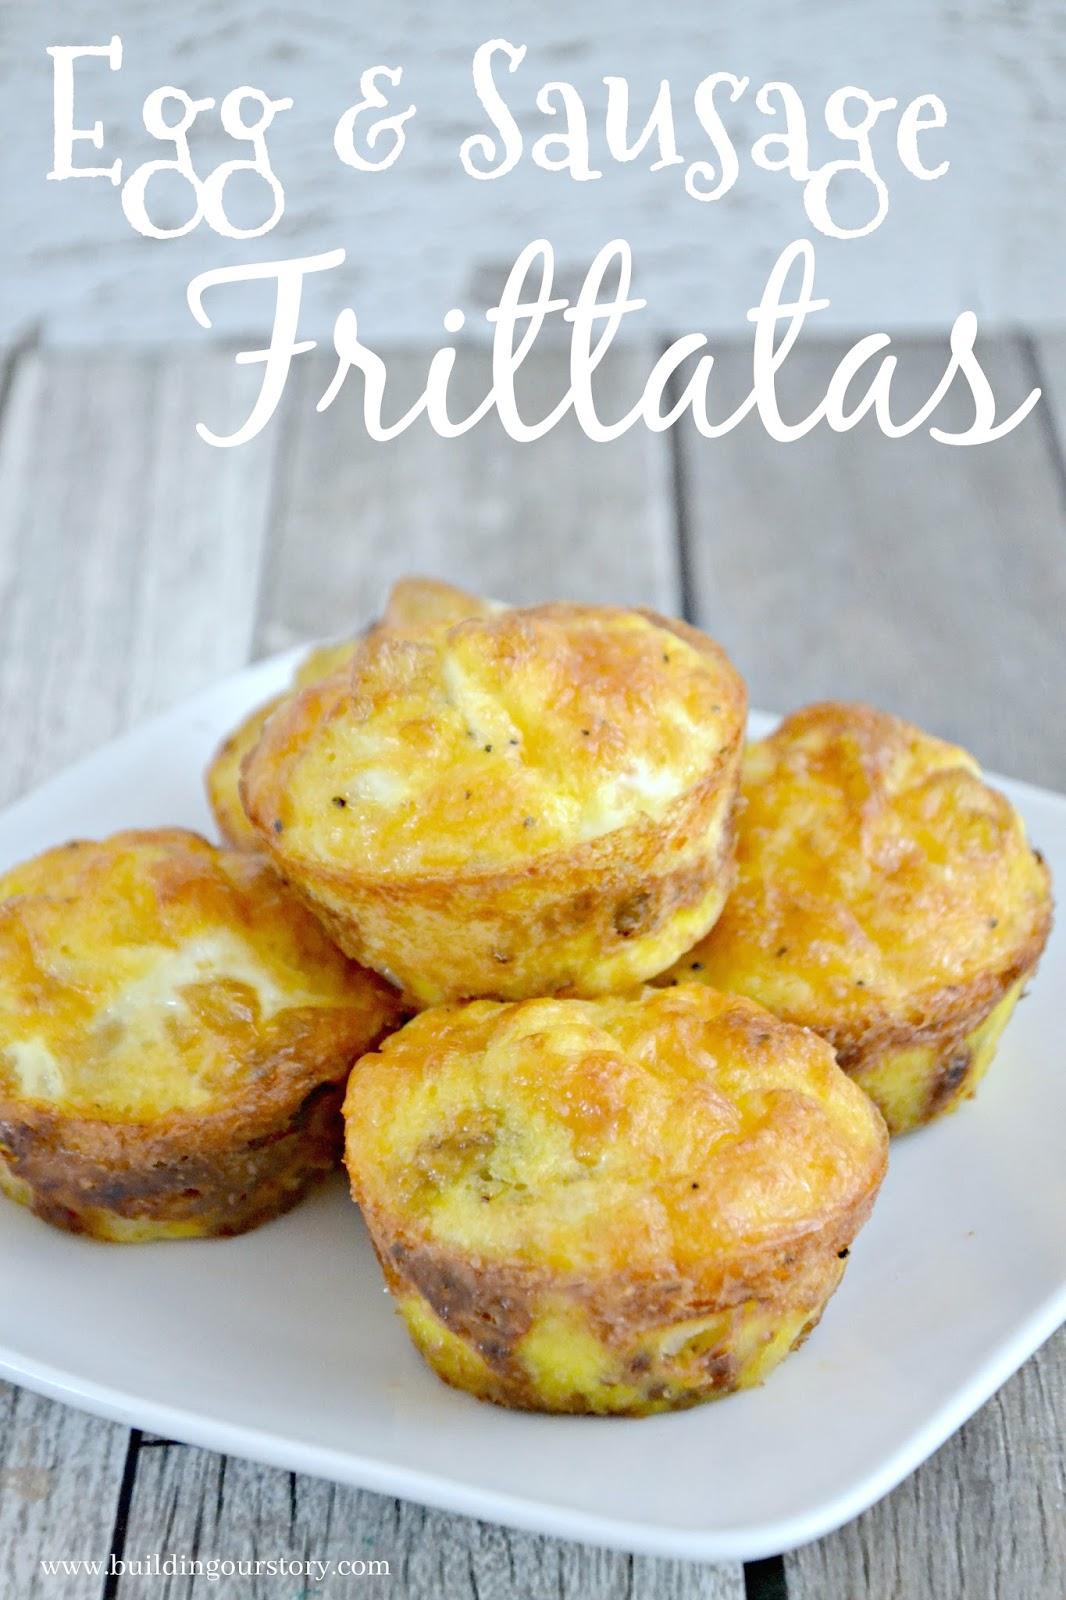 ... Cheese Frittatas, Mini Muffin frittatas, frittatas recipes, breakfast